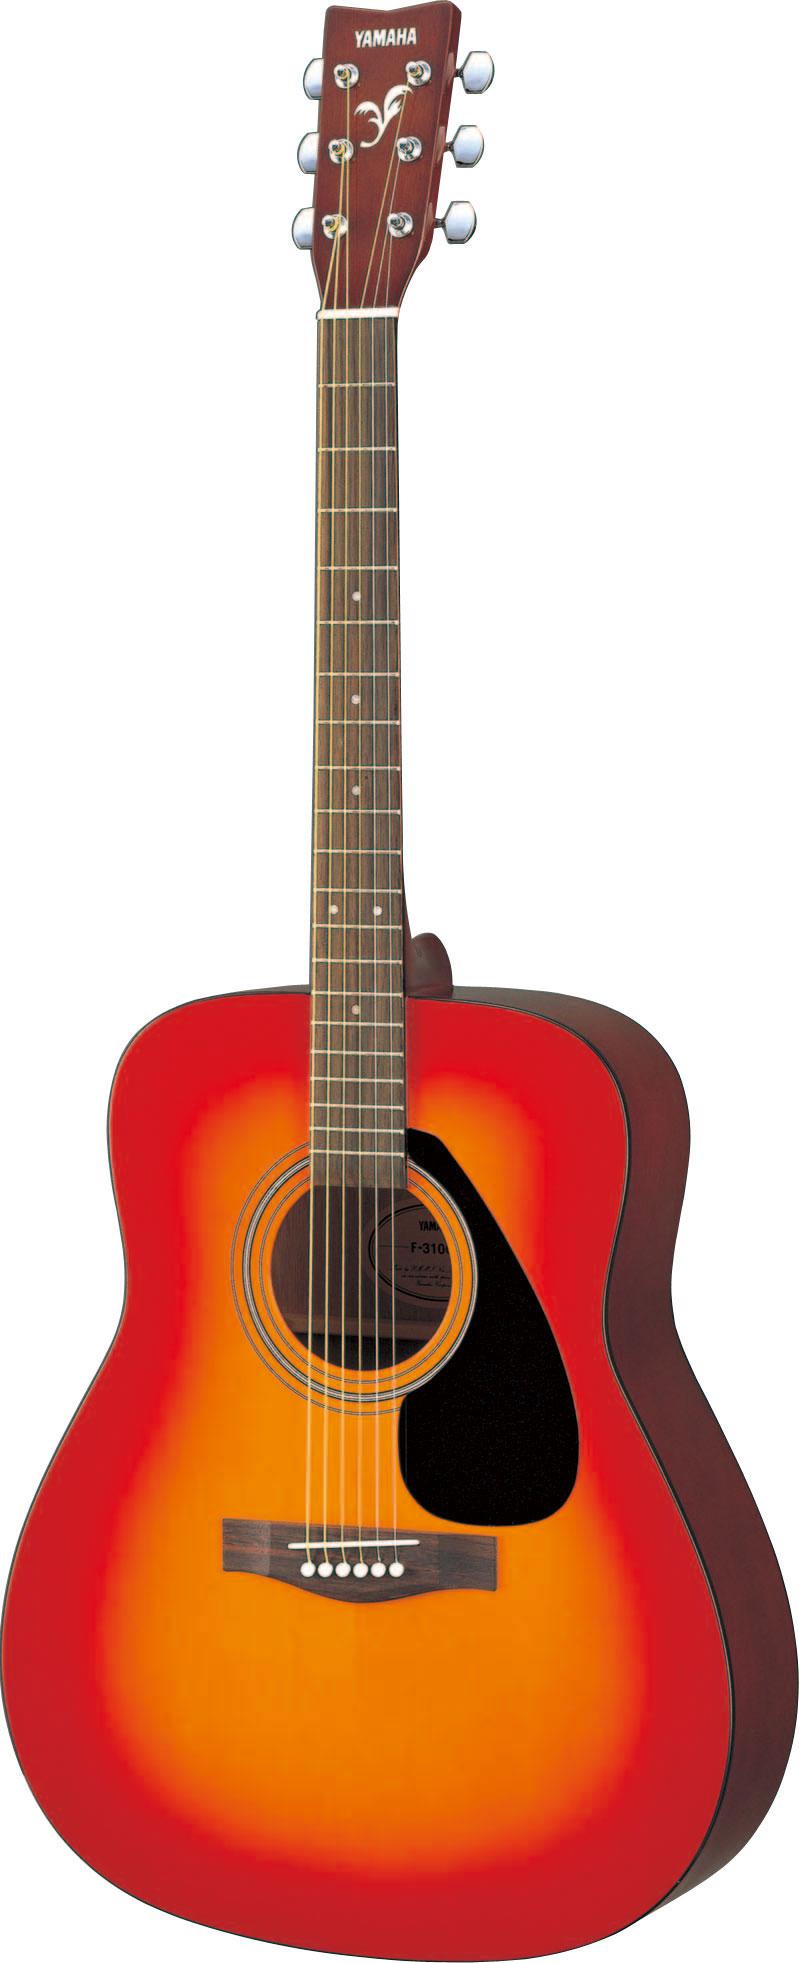 Yamaha Guitars Usa